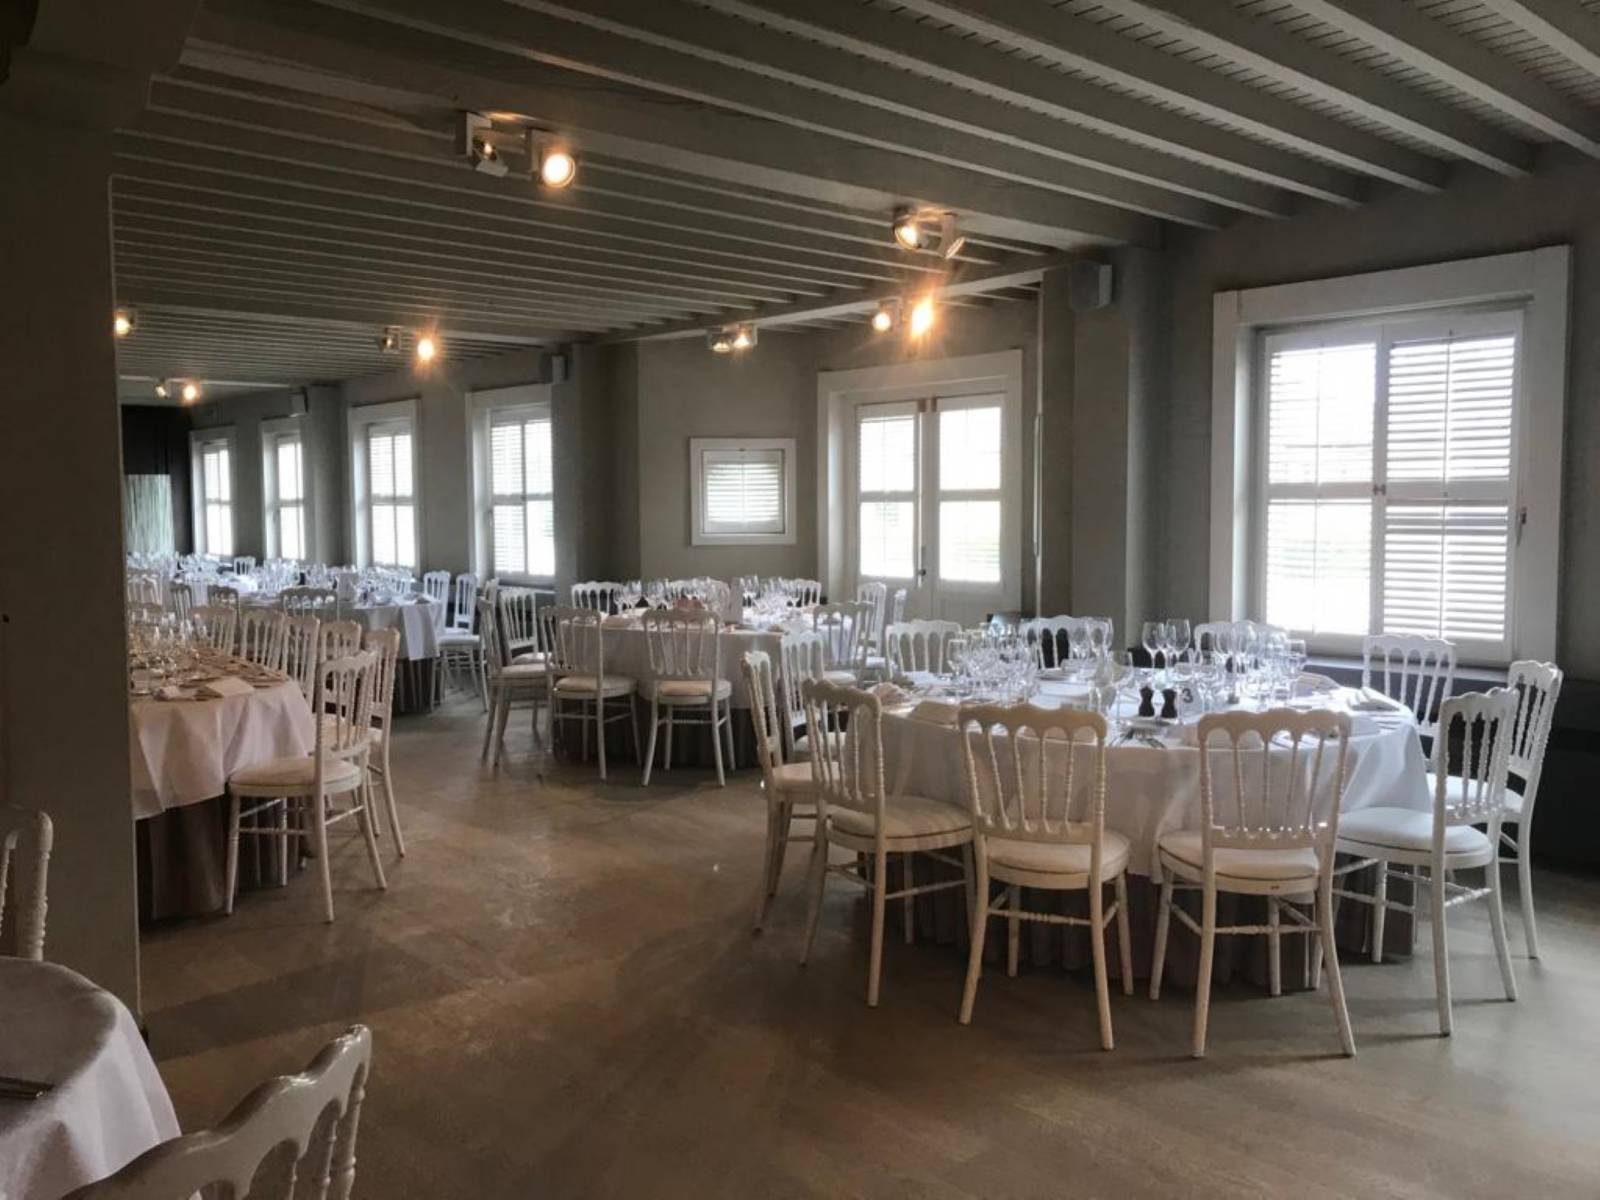 Feestzaal - Klokhof - House of Events(2)